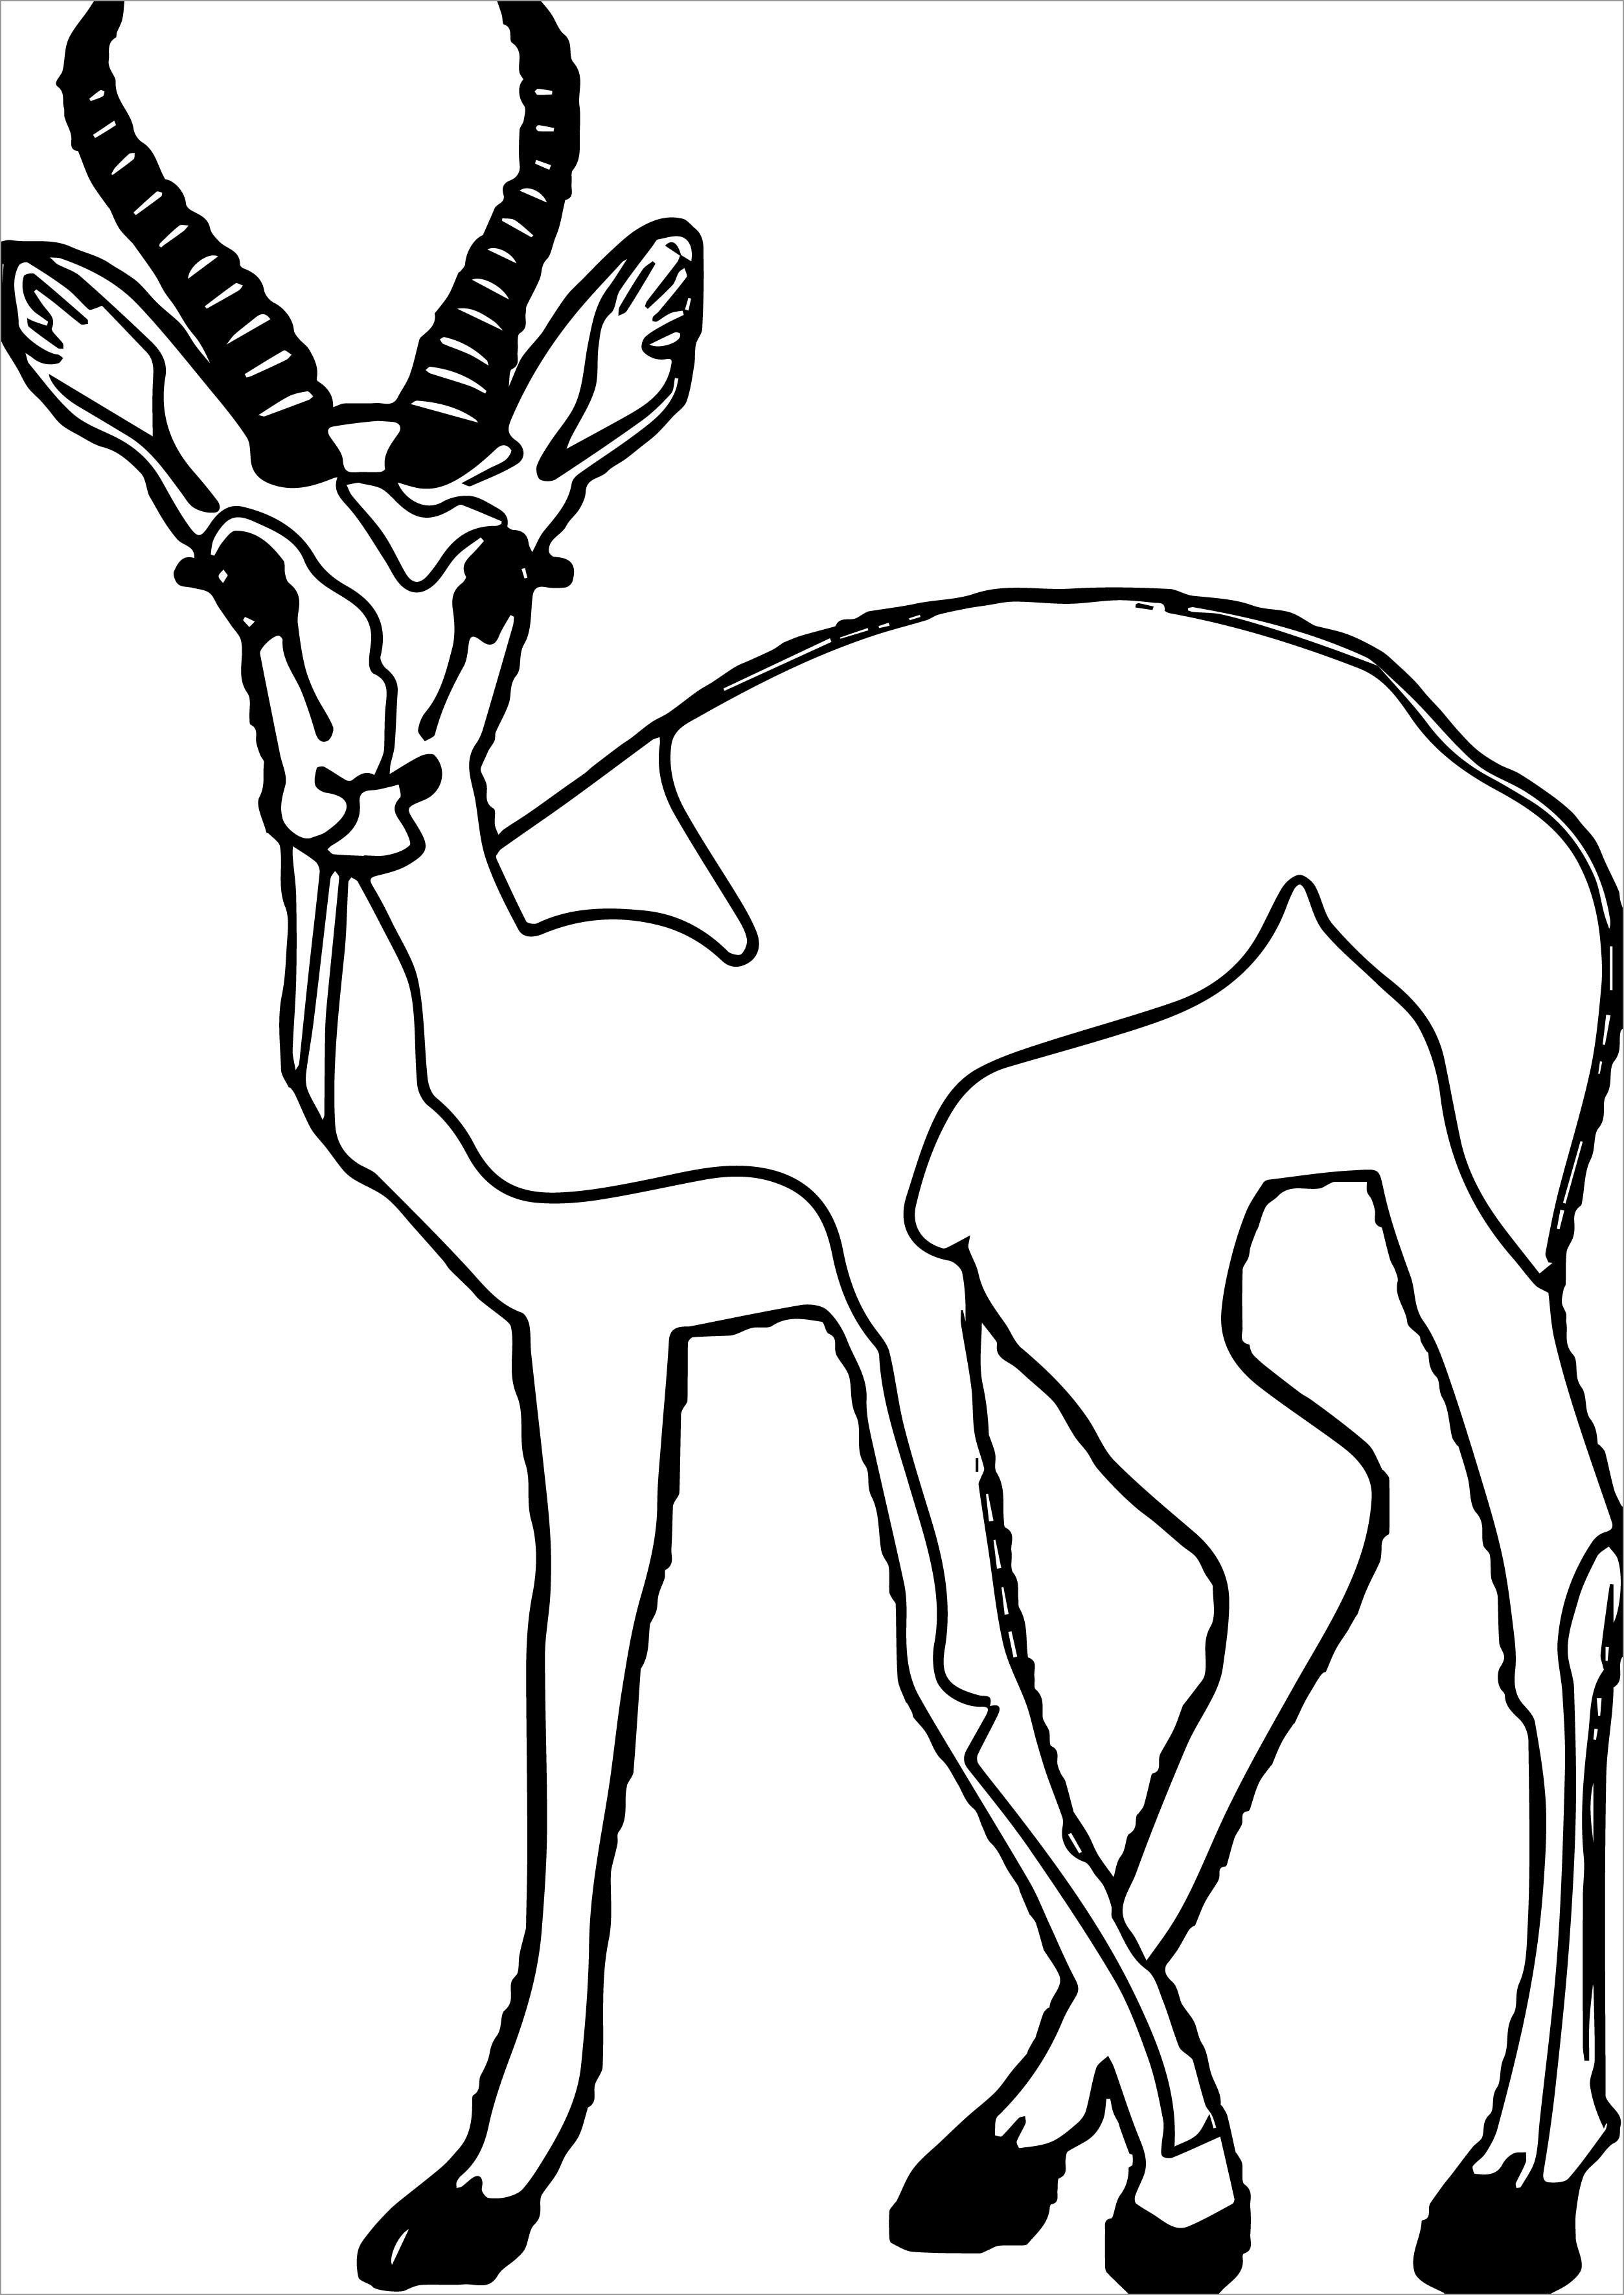 Staring Antelope Coloring Page